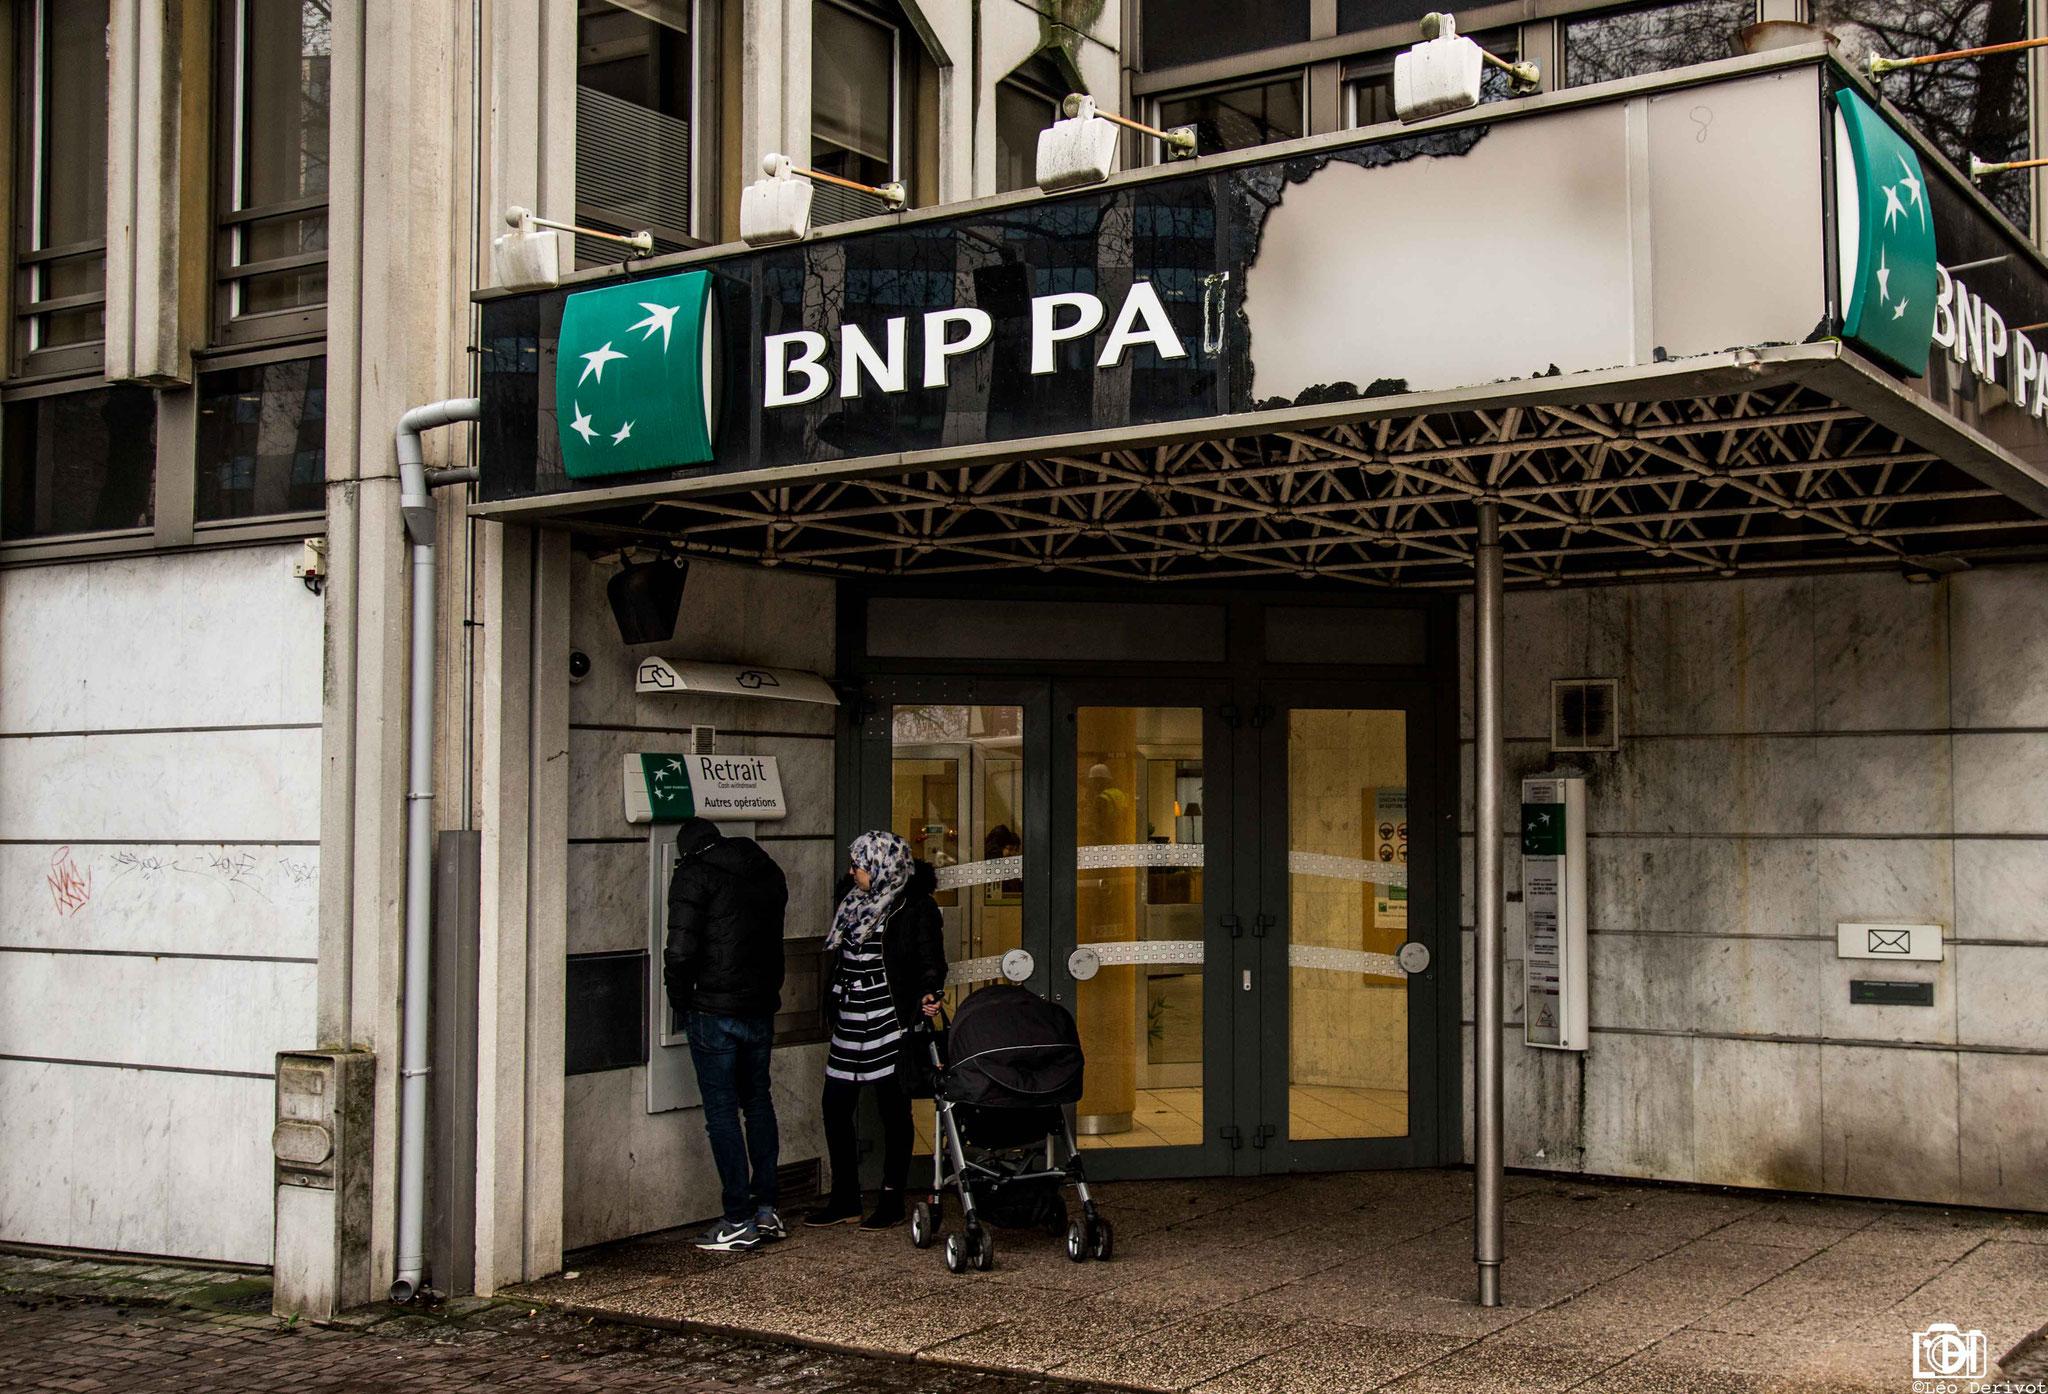 BNP, Rouen, 2018